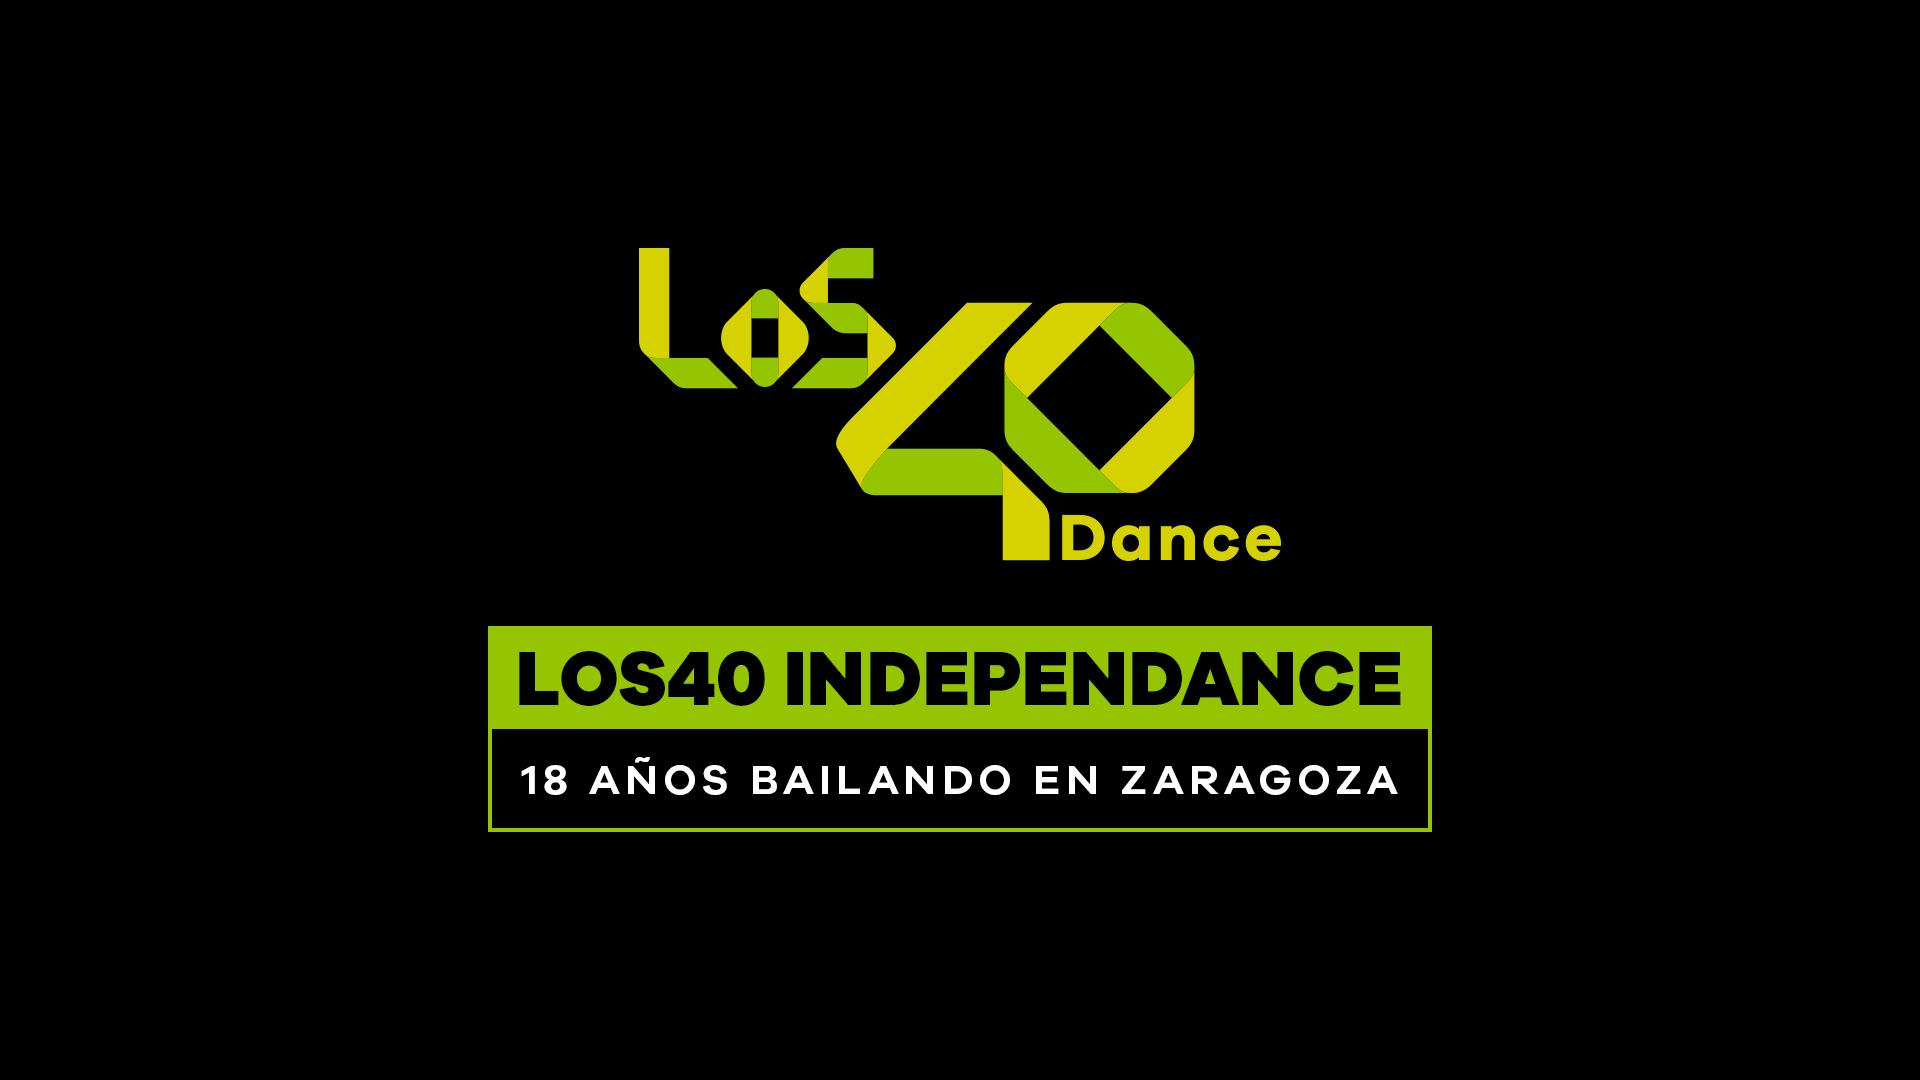 LOS40 Dance celebra su primer aniversario